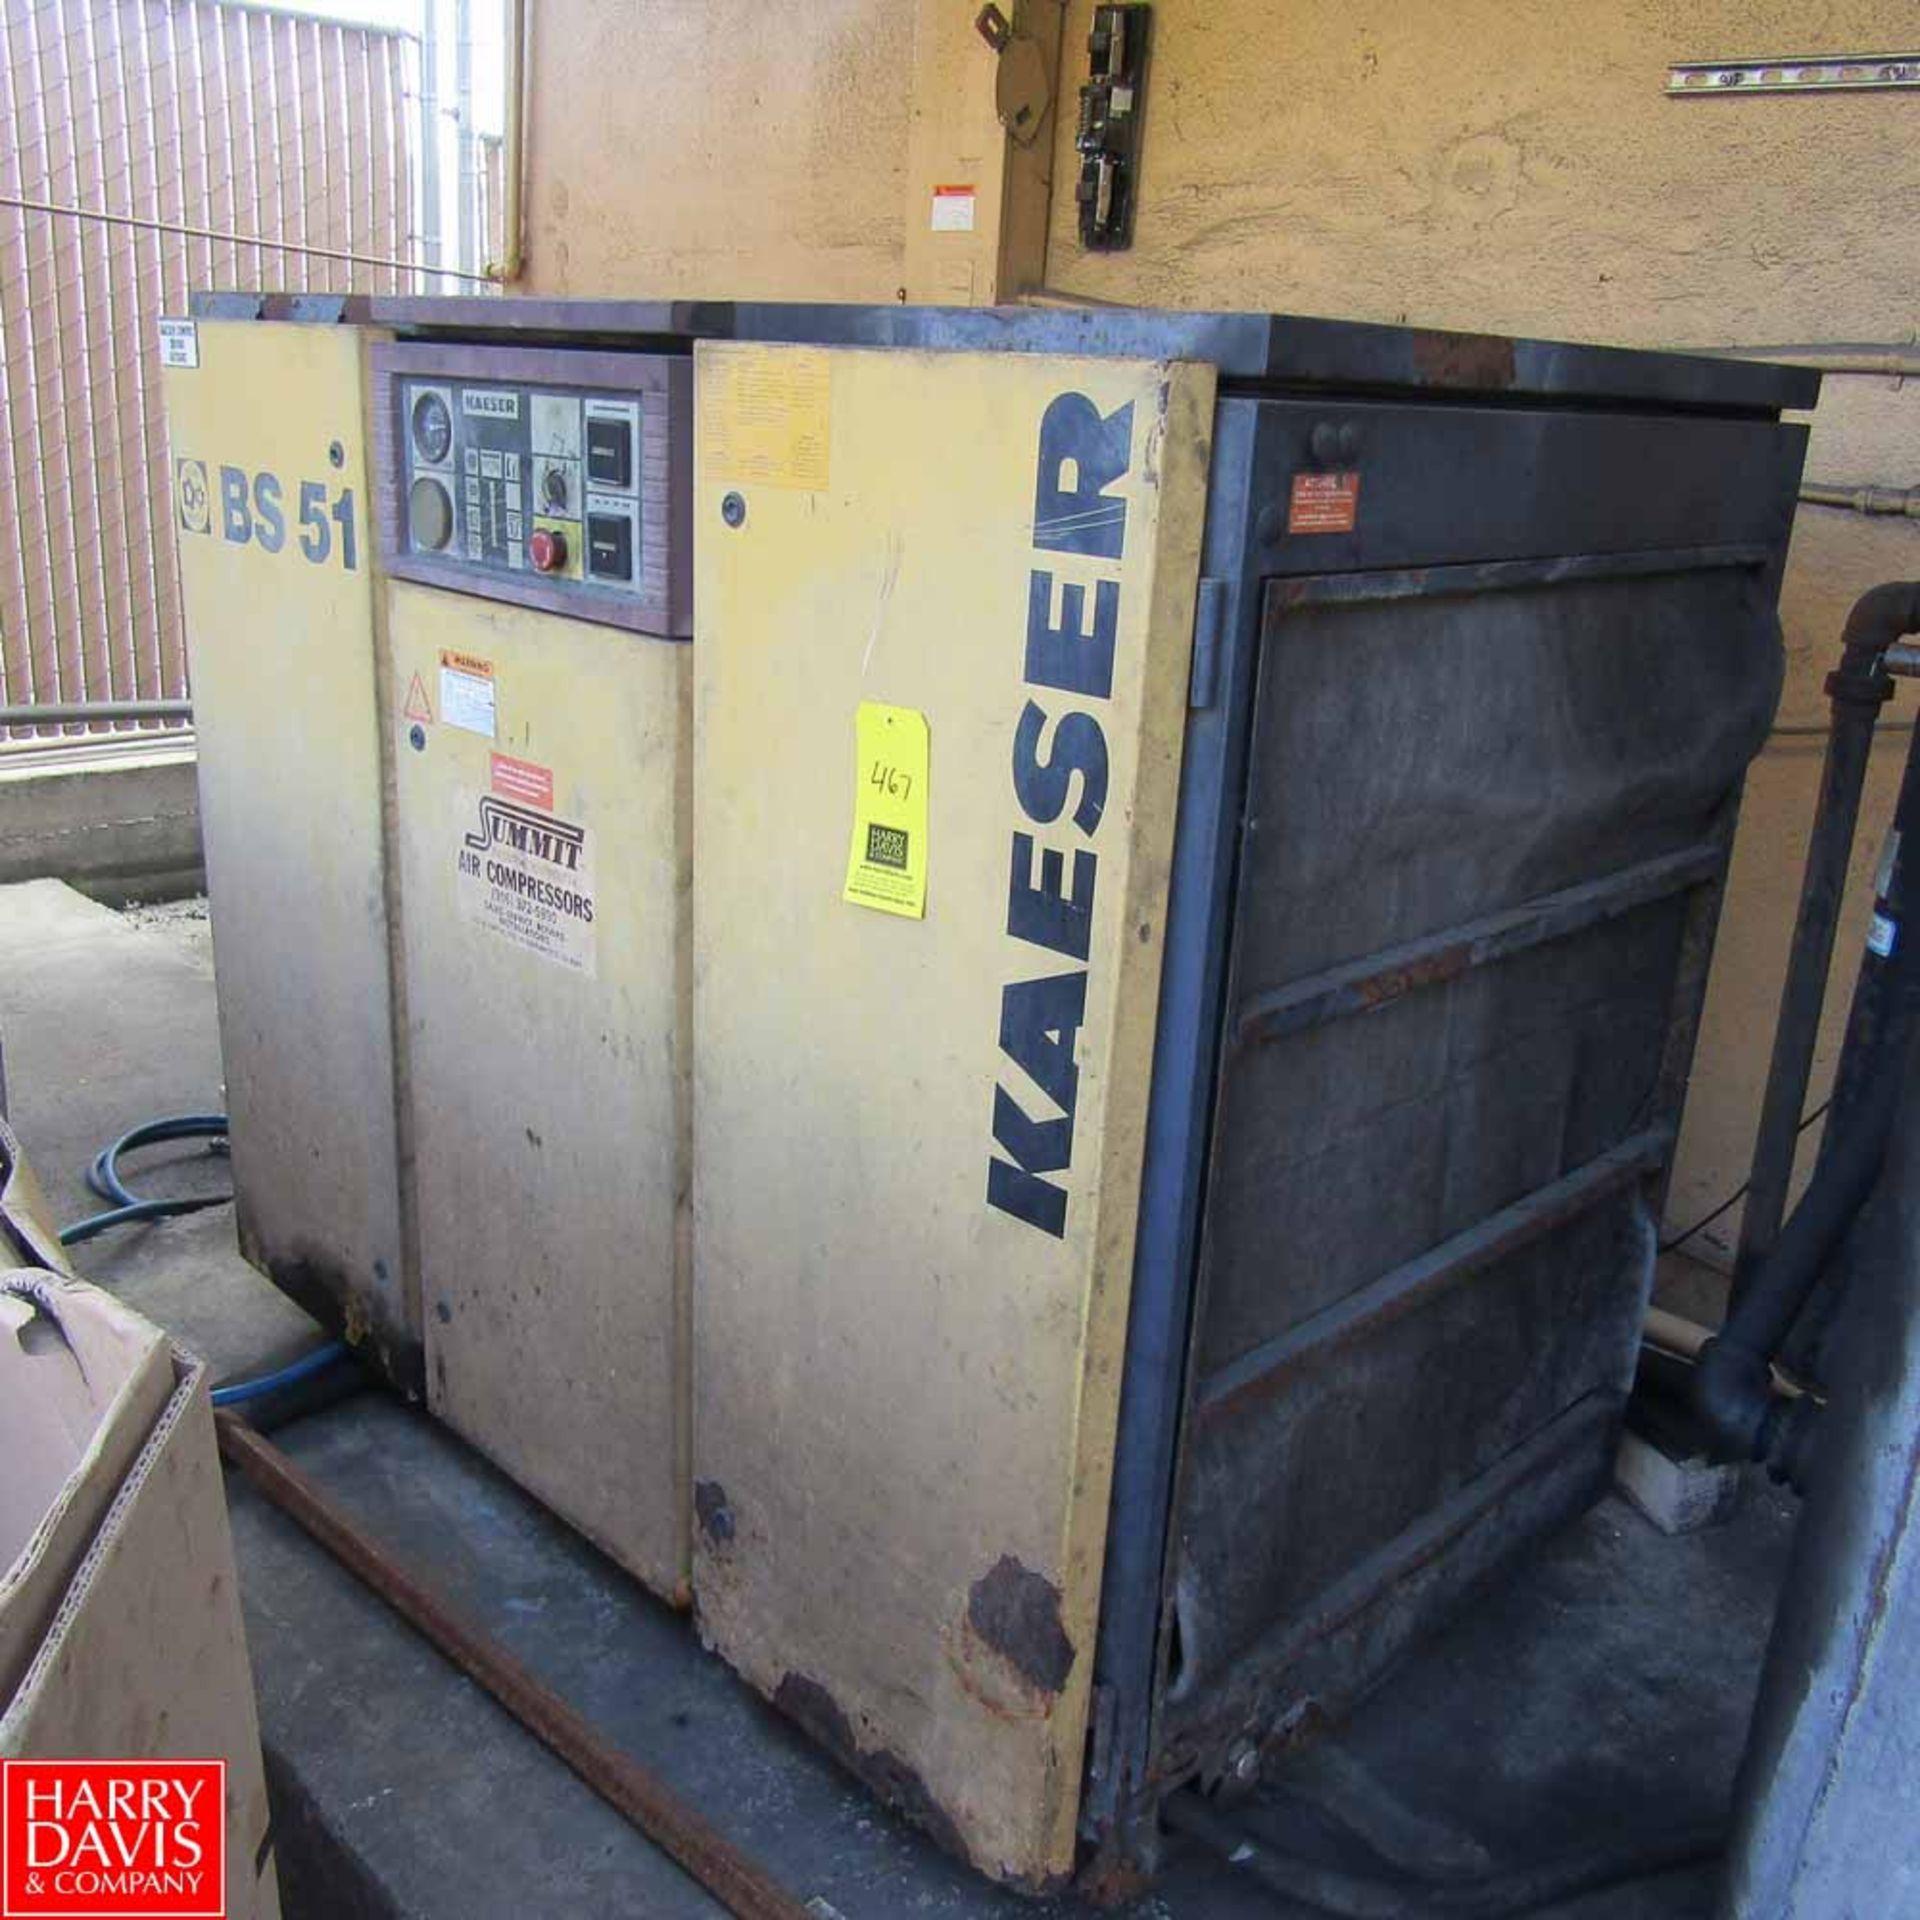 Lot 467 - Kaeser Compressor Model BS-51 Rigging Fee: 500